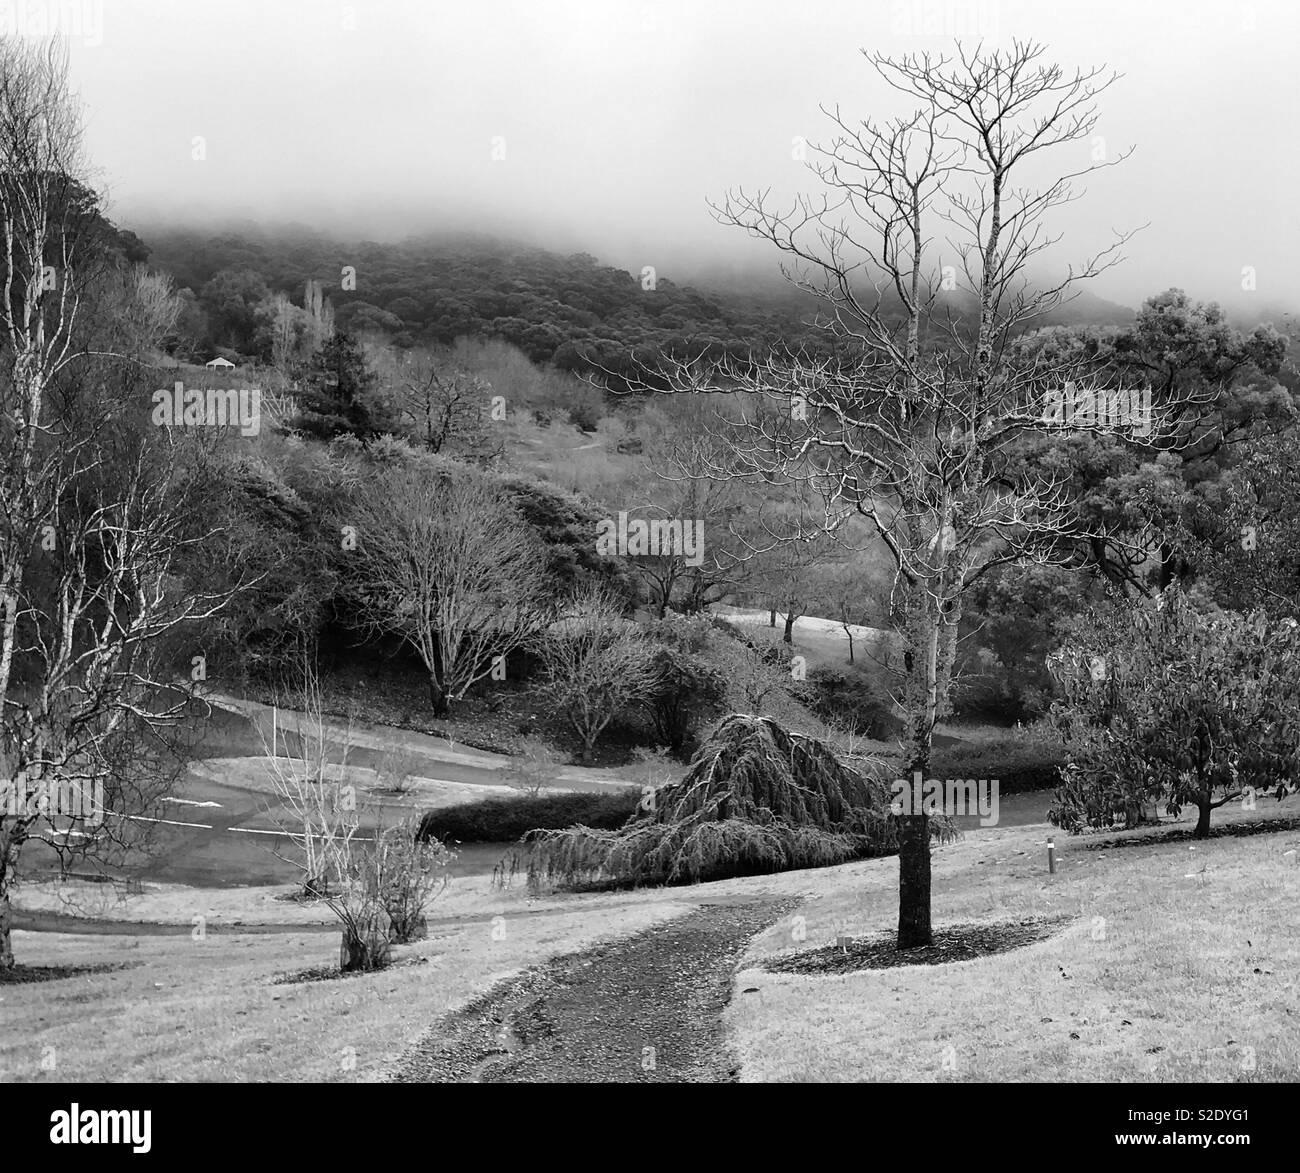 Mount lofty botanical gardens 💕 xx - Stock Image